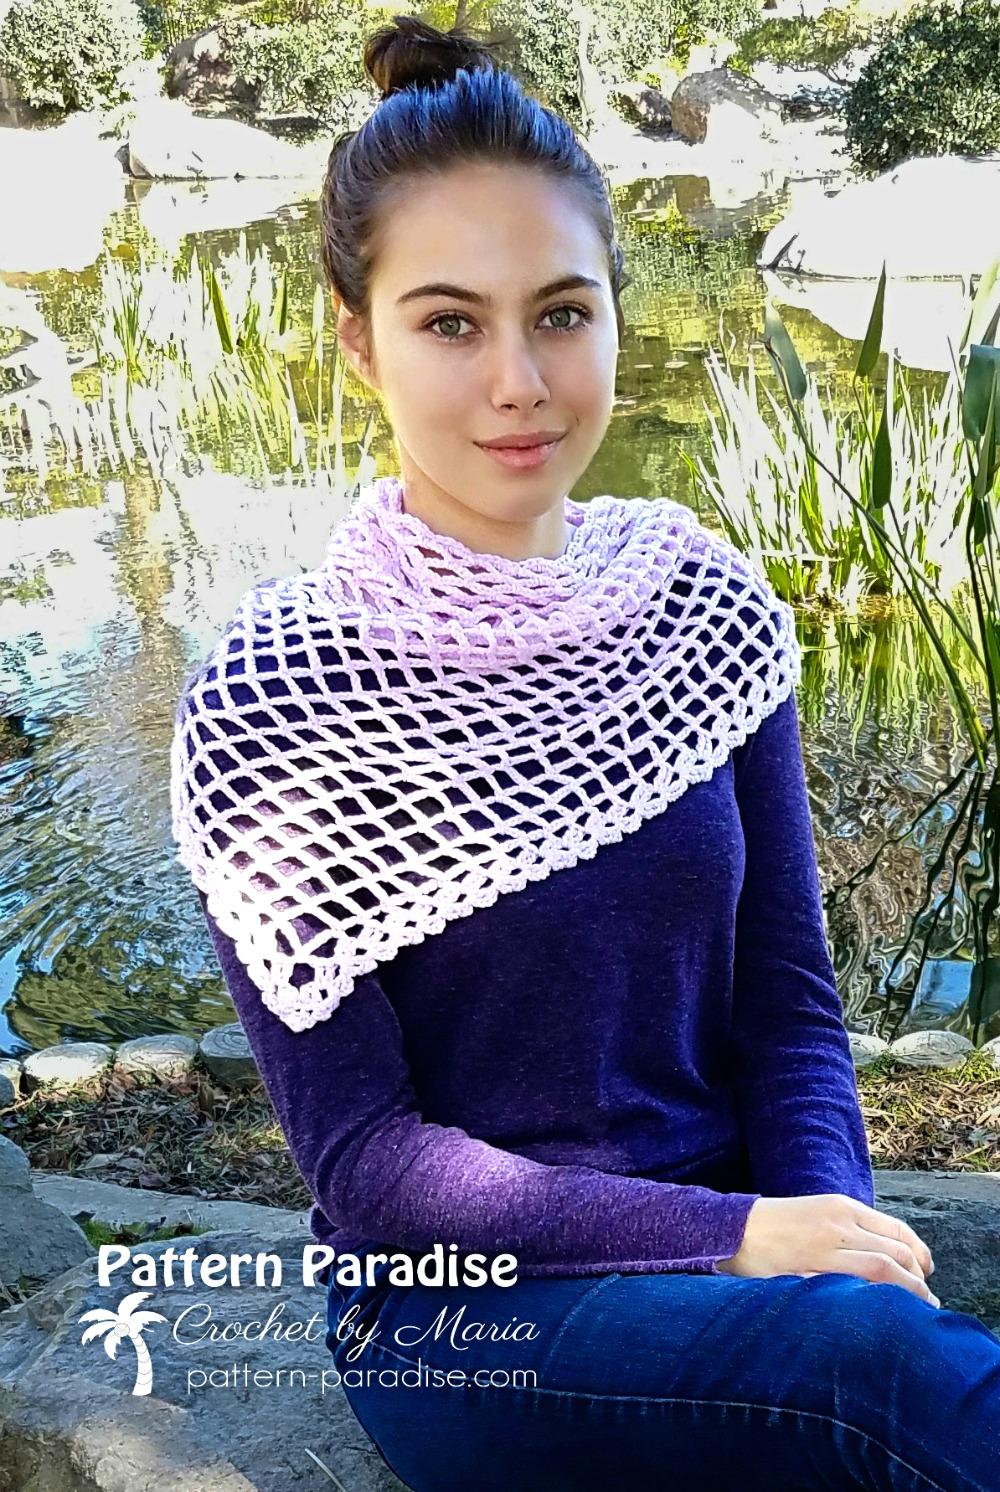 Free Crochet Pattern Valerie Shawl Wrap by Pattern-Paradise.com